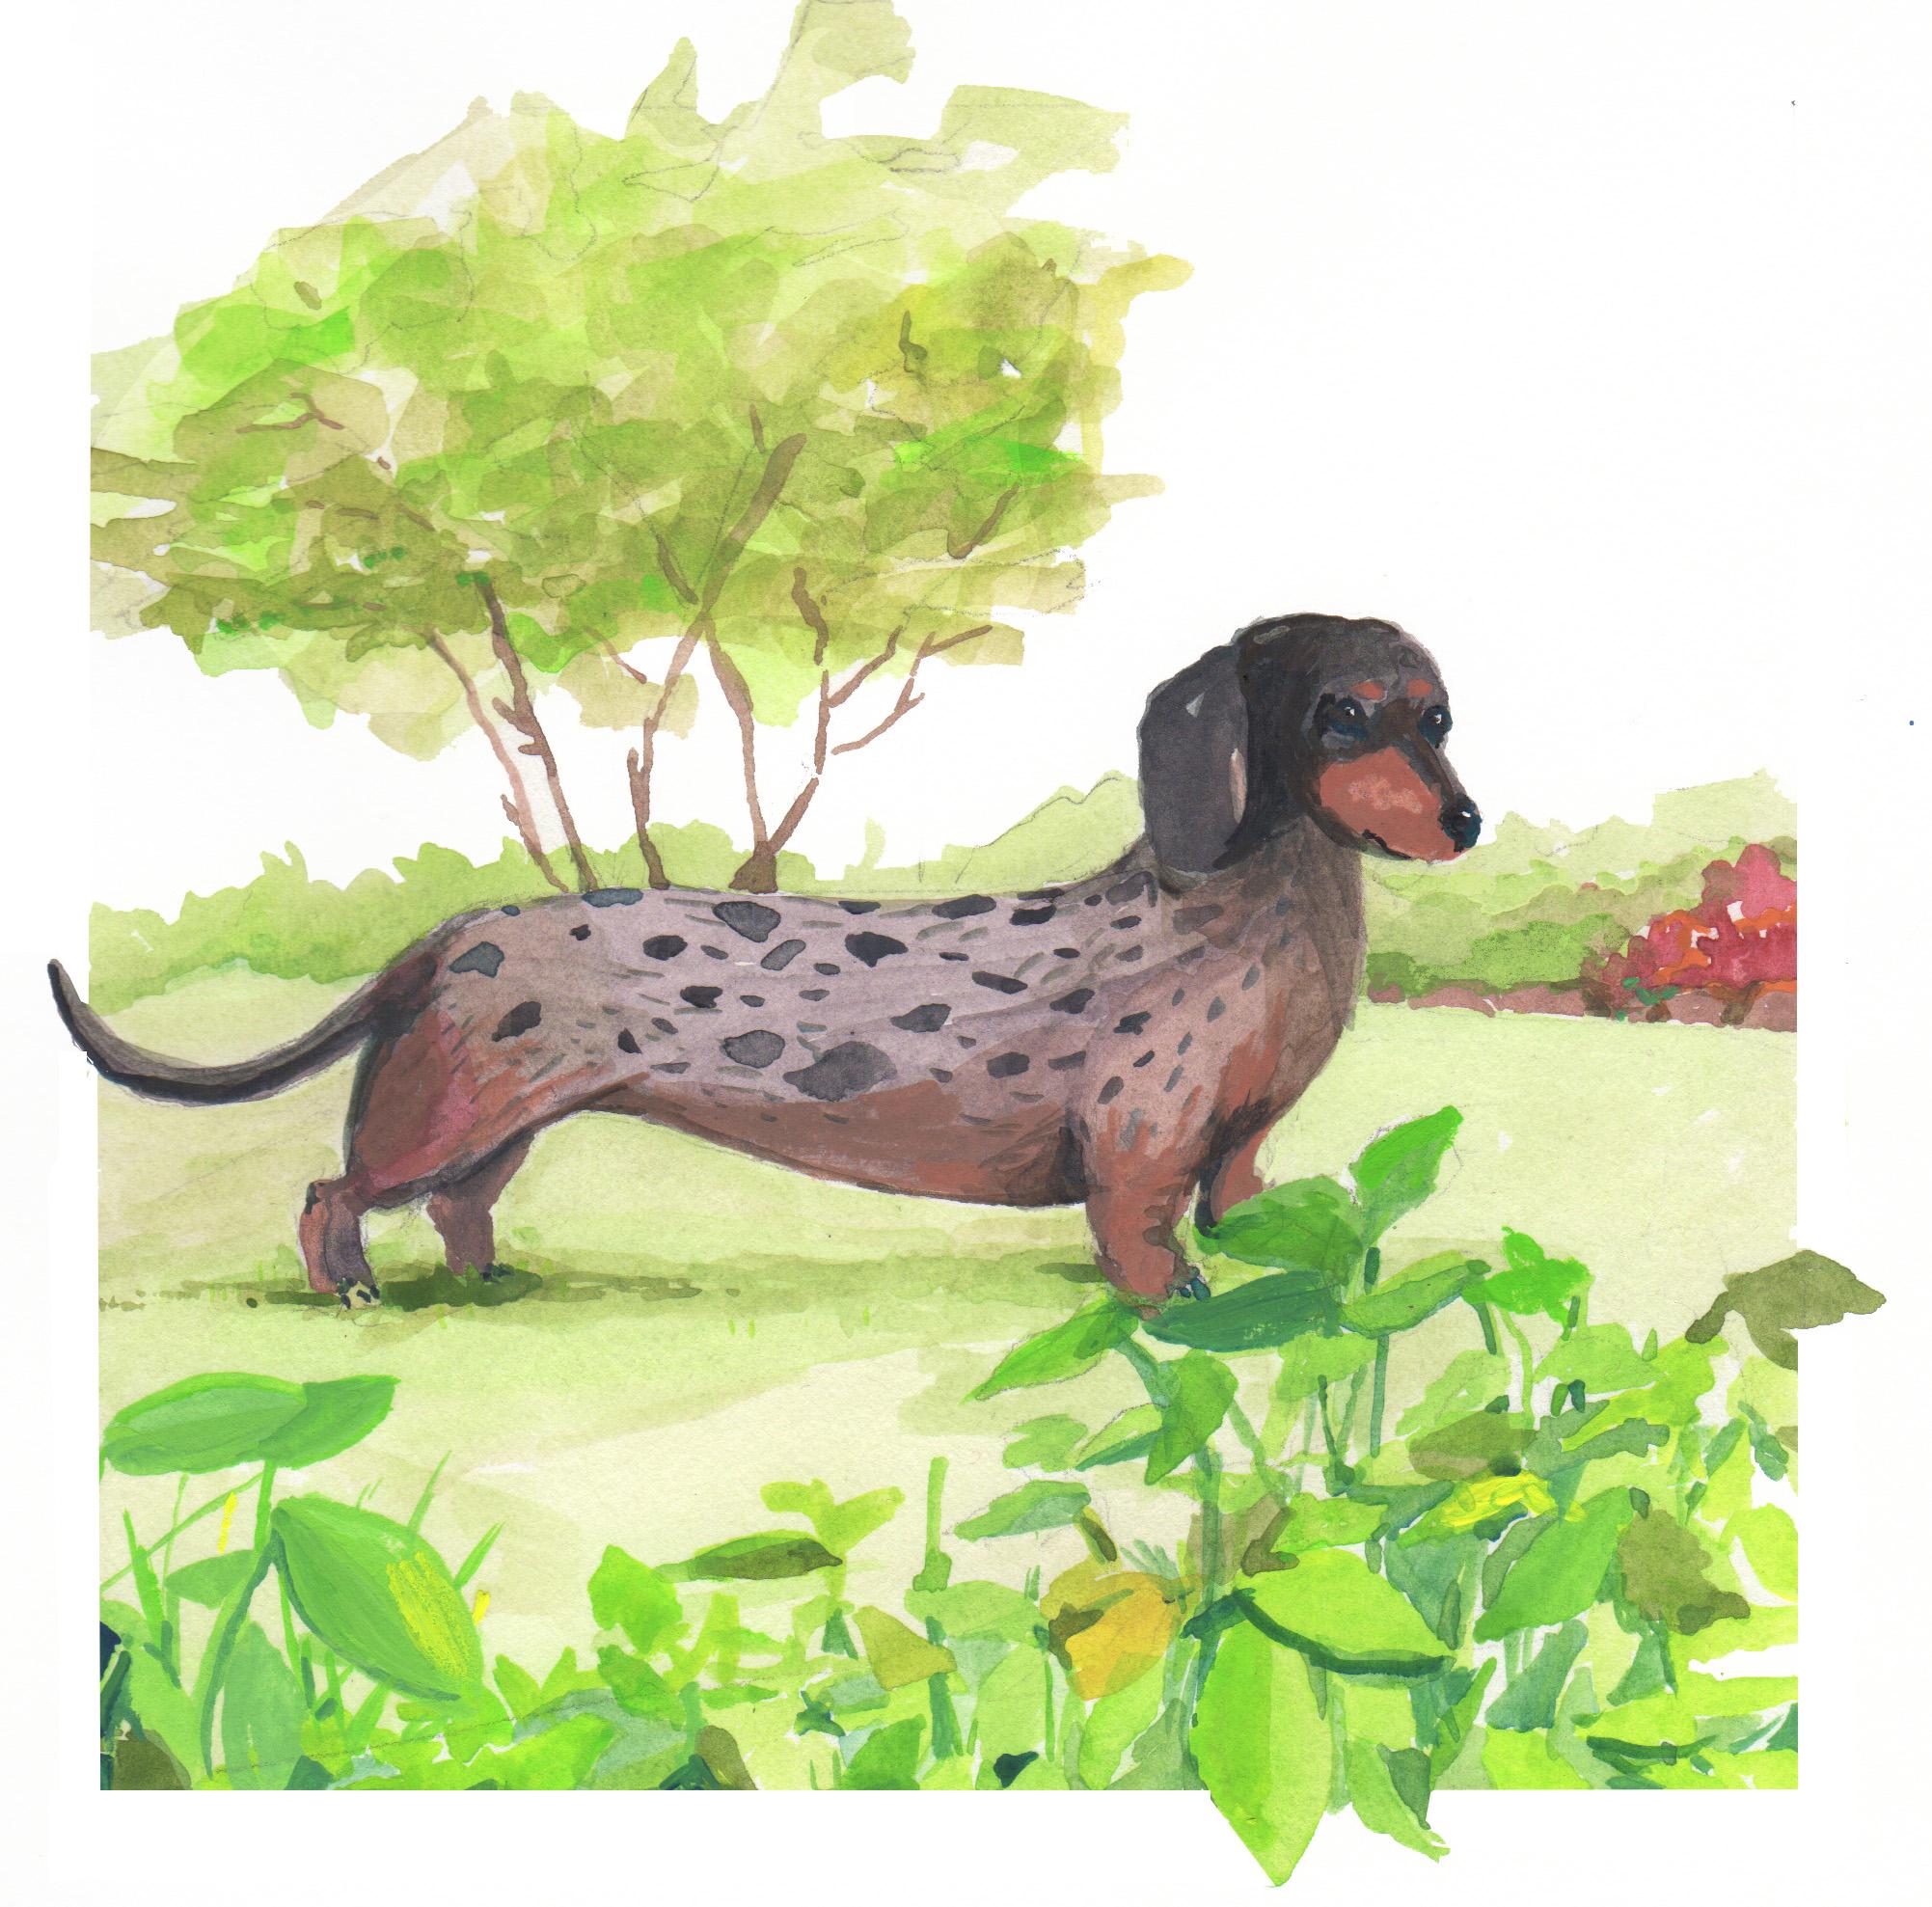 dachshund painting.jpg